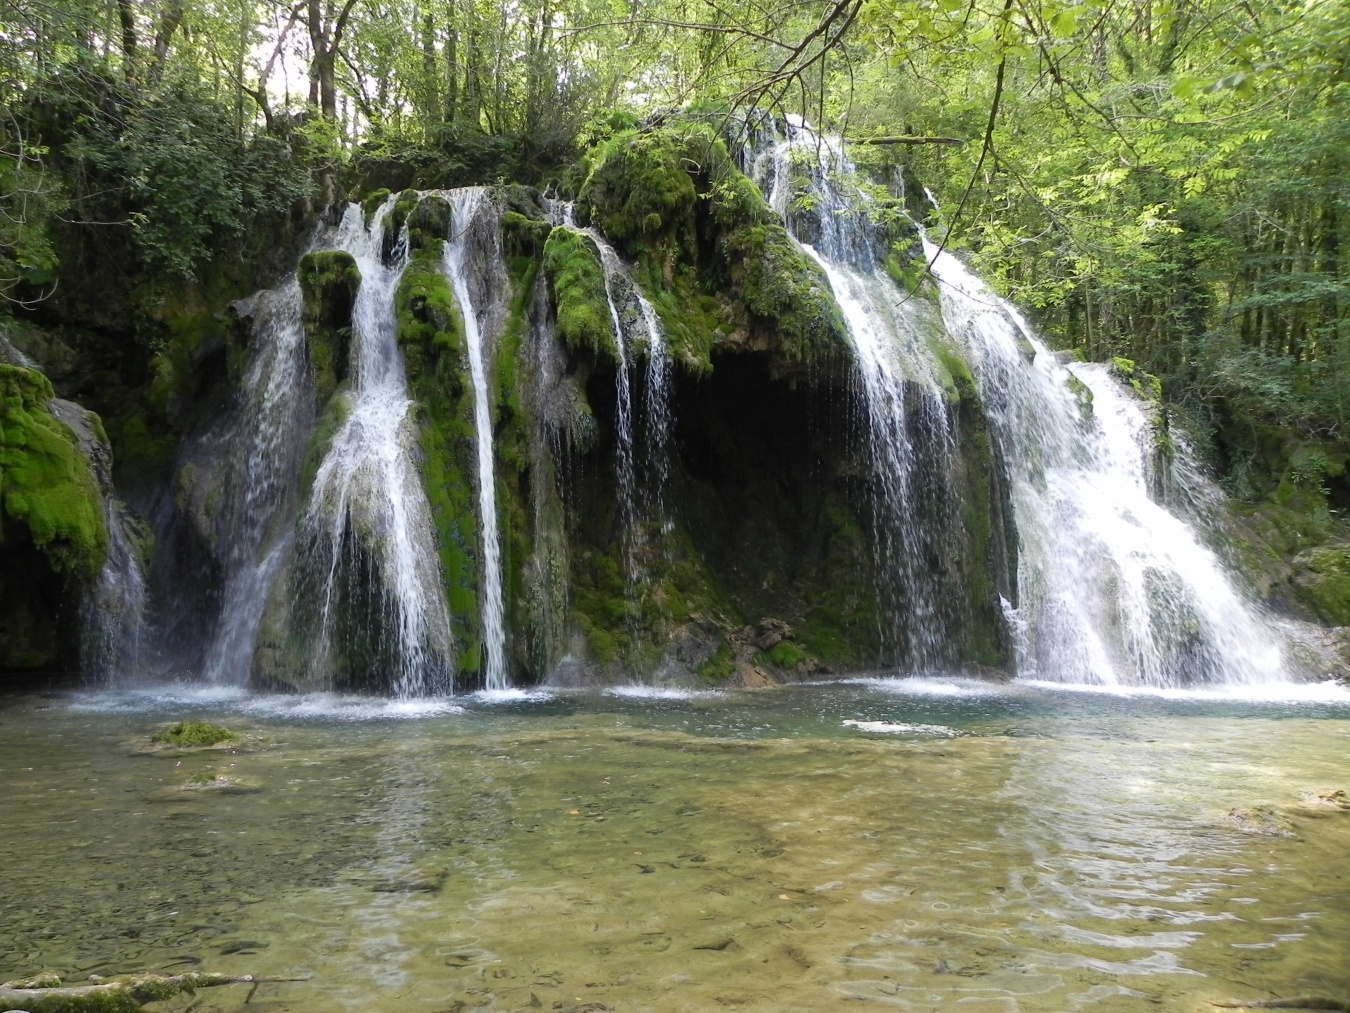 la cascade du Tuf à Mesnay par Bébert